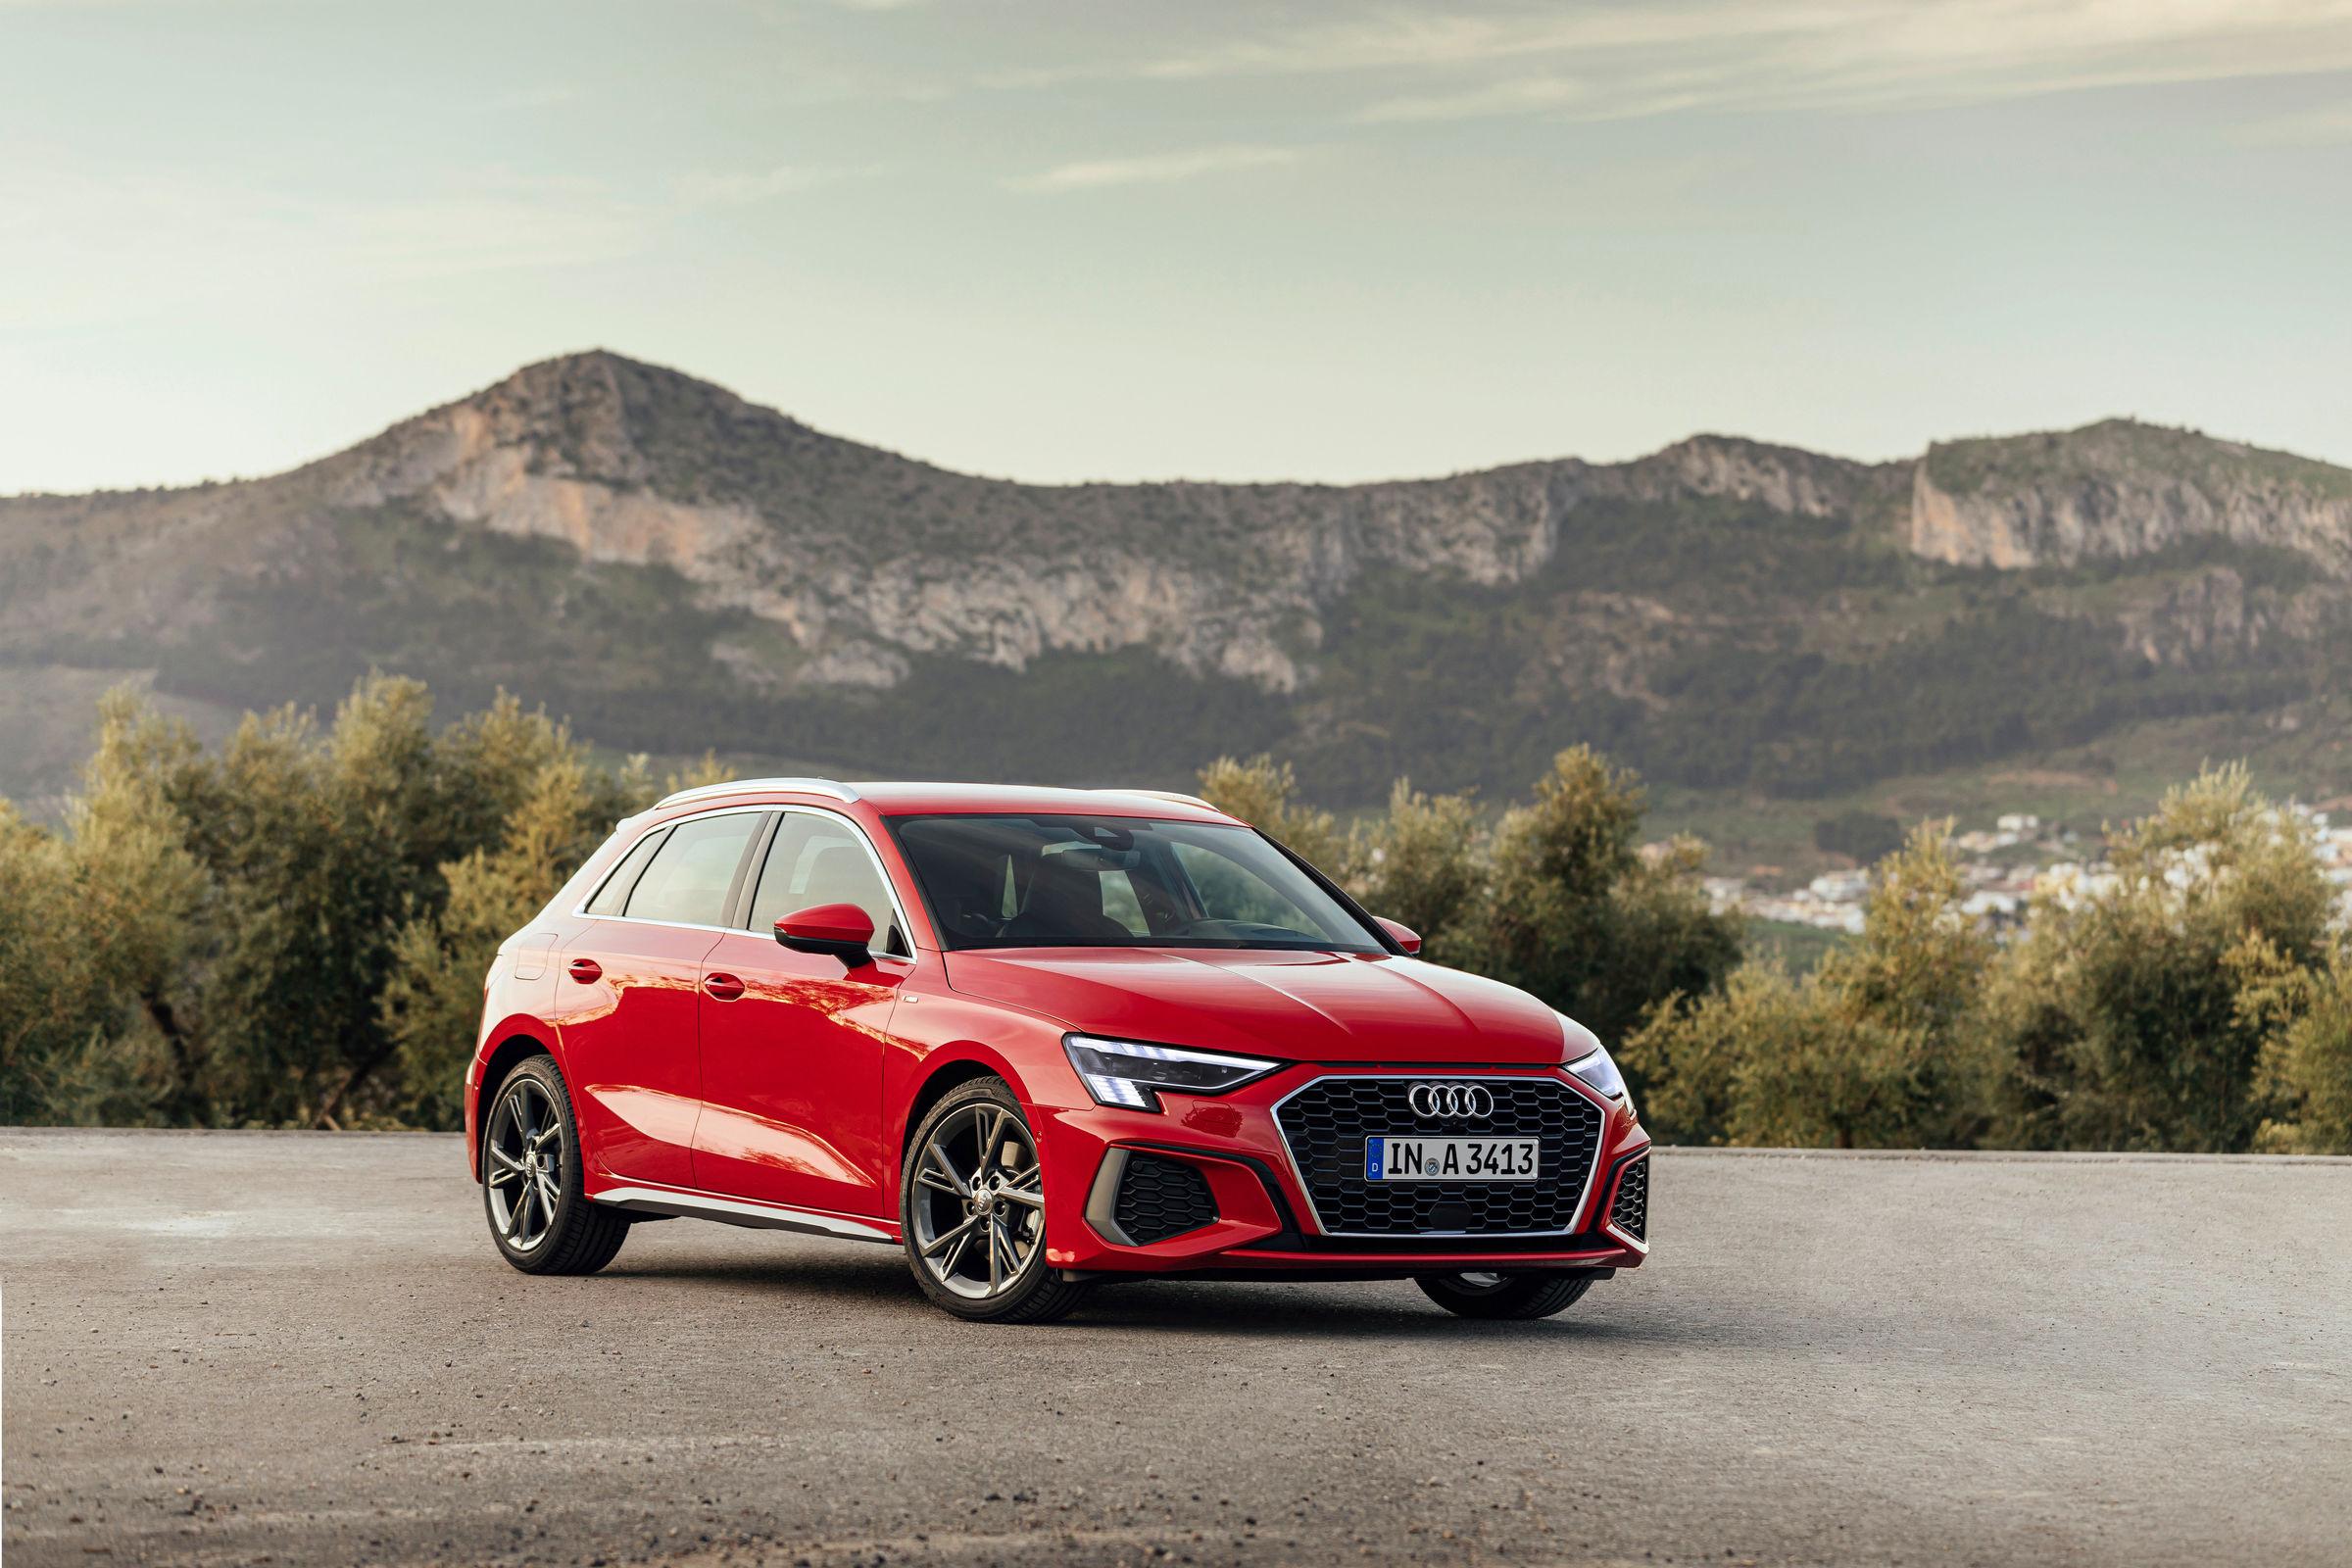 Success model 4.0: the new Audi A3 Sportback - Image 6